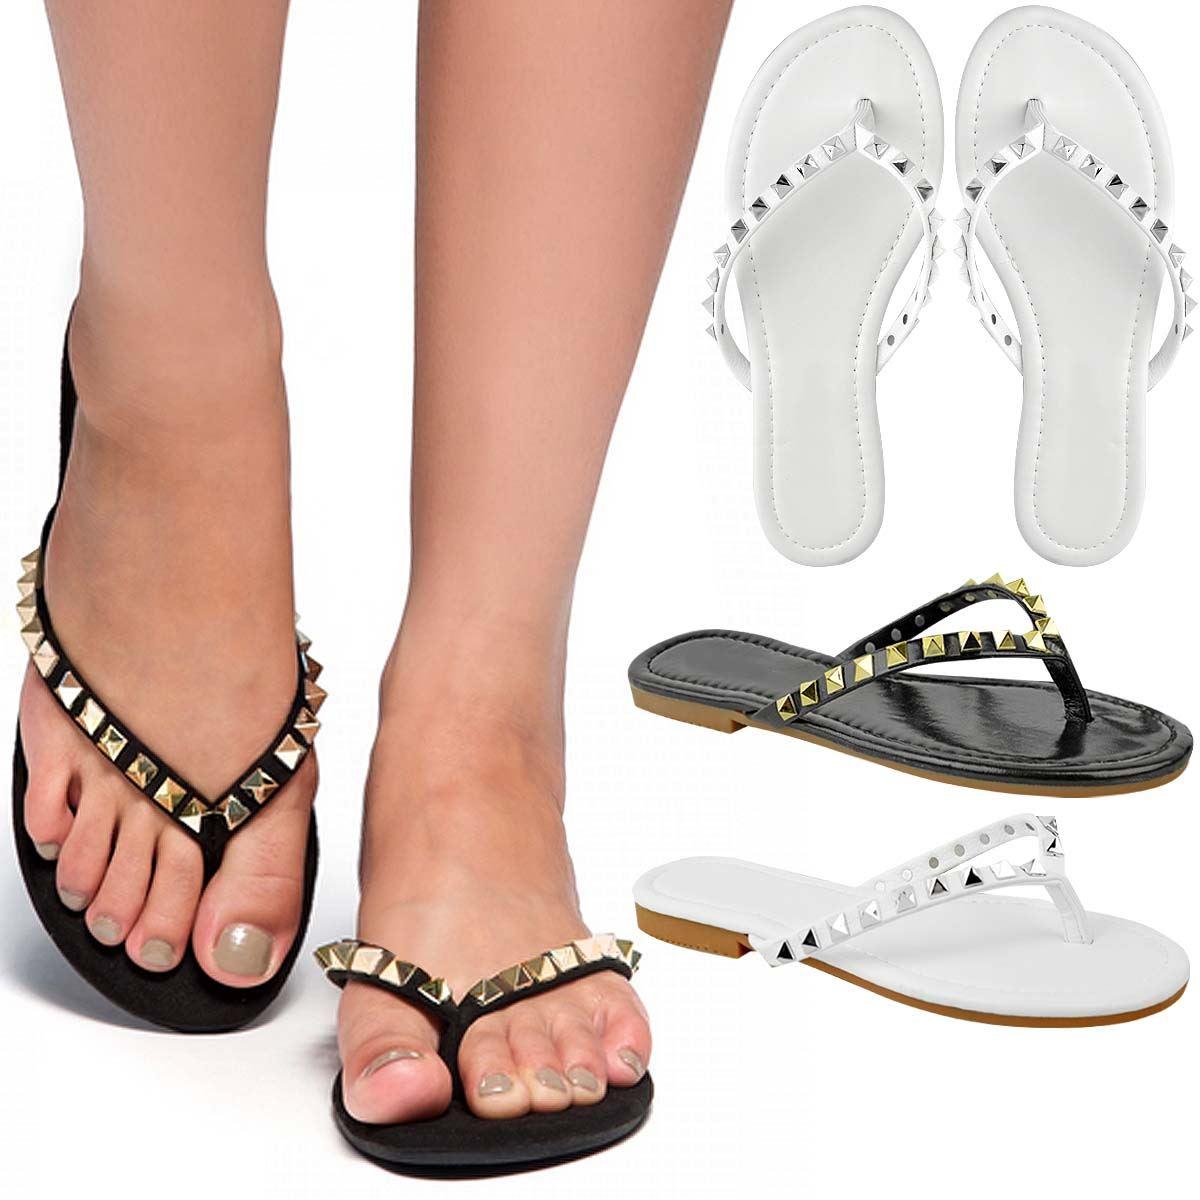 Men/Women New Womens Ladies Flat Studded Thong Toe Flip Post Sandals Summer Casual Flip Toe Flops Crazy price, Birmingham Low price Good quality NR141 eae390